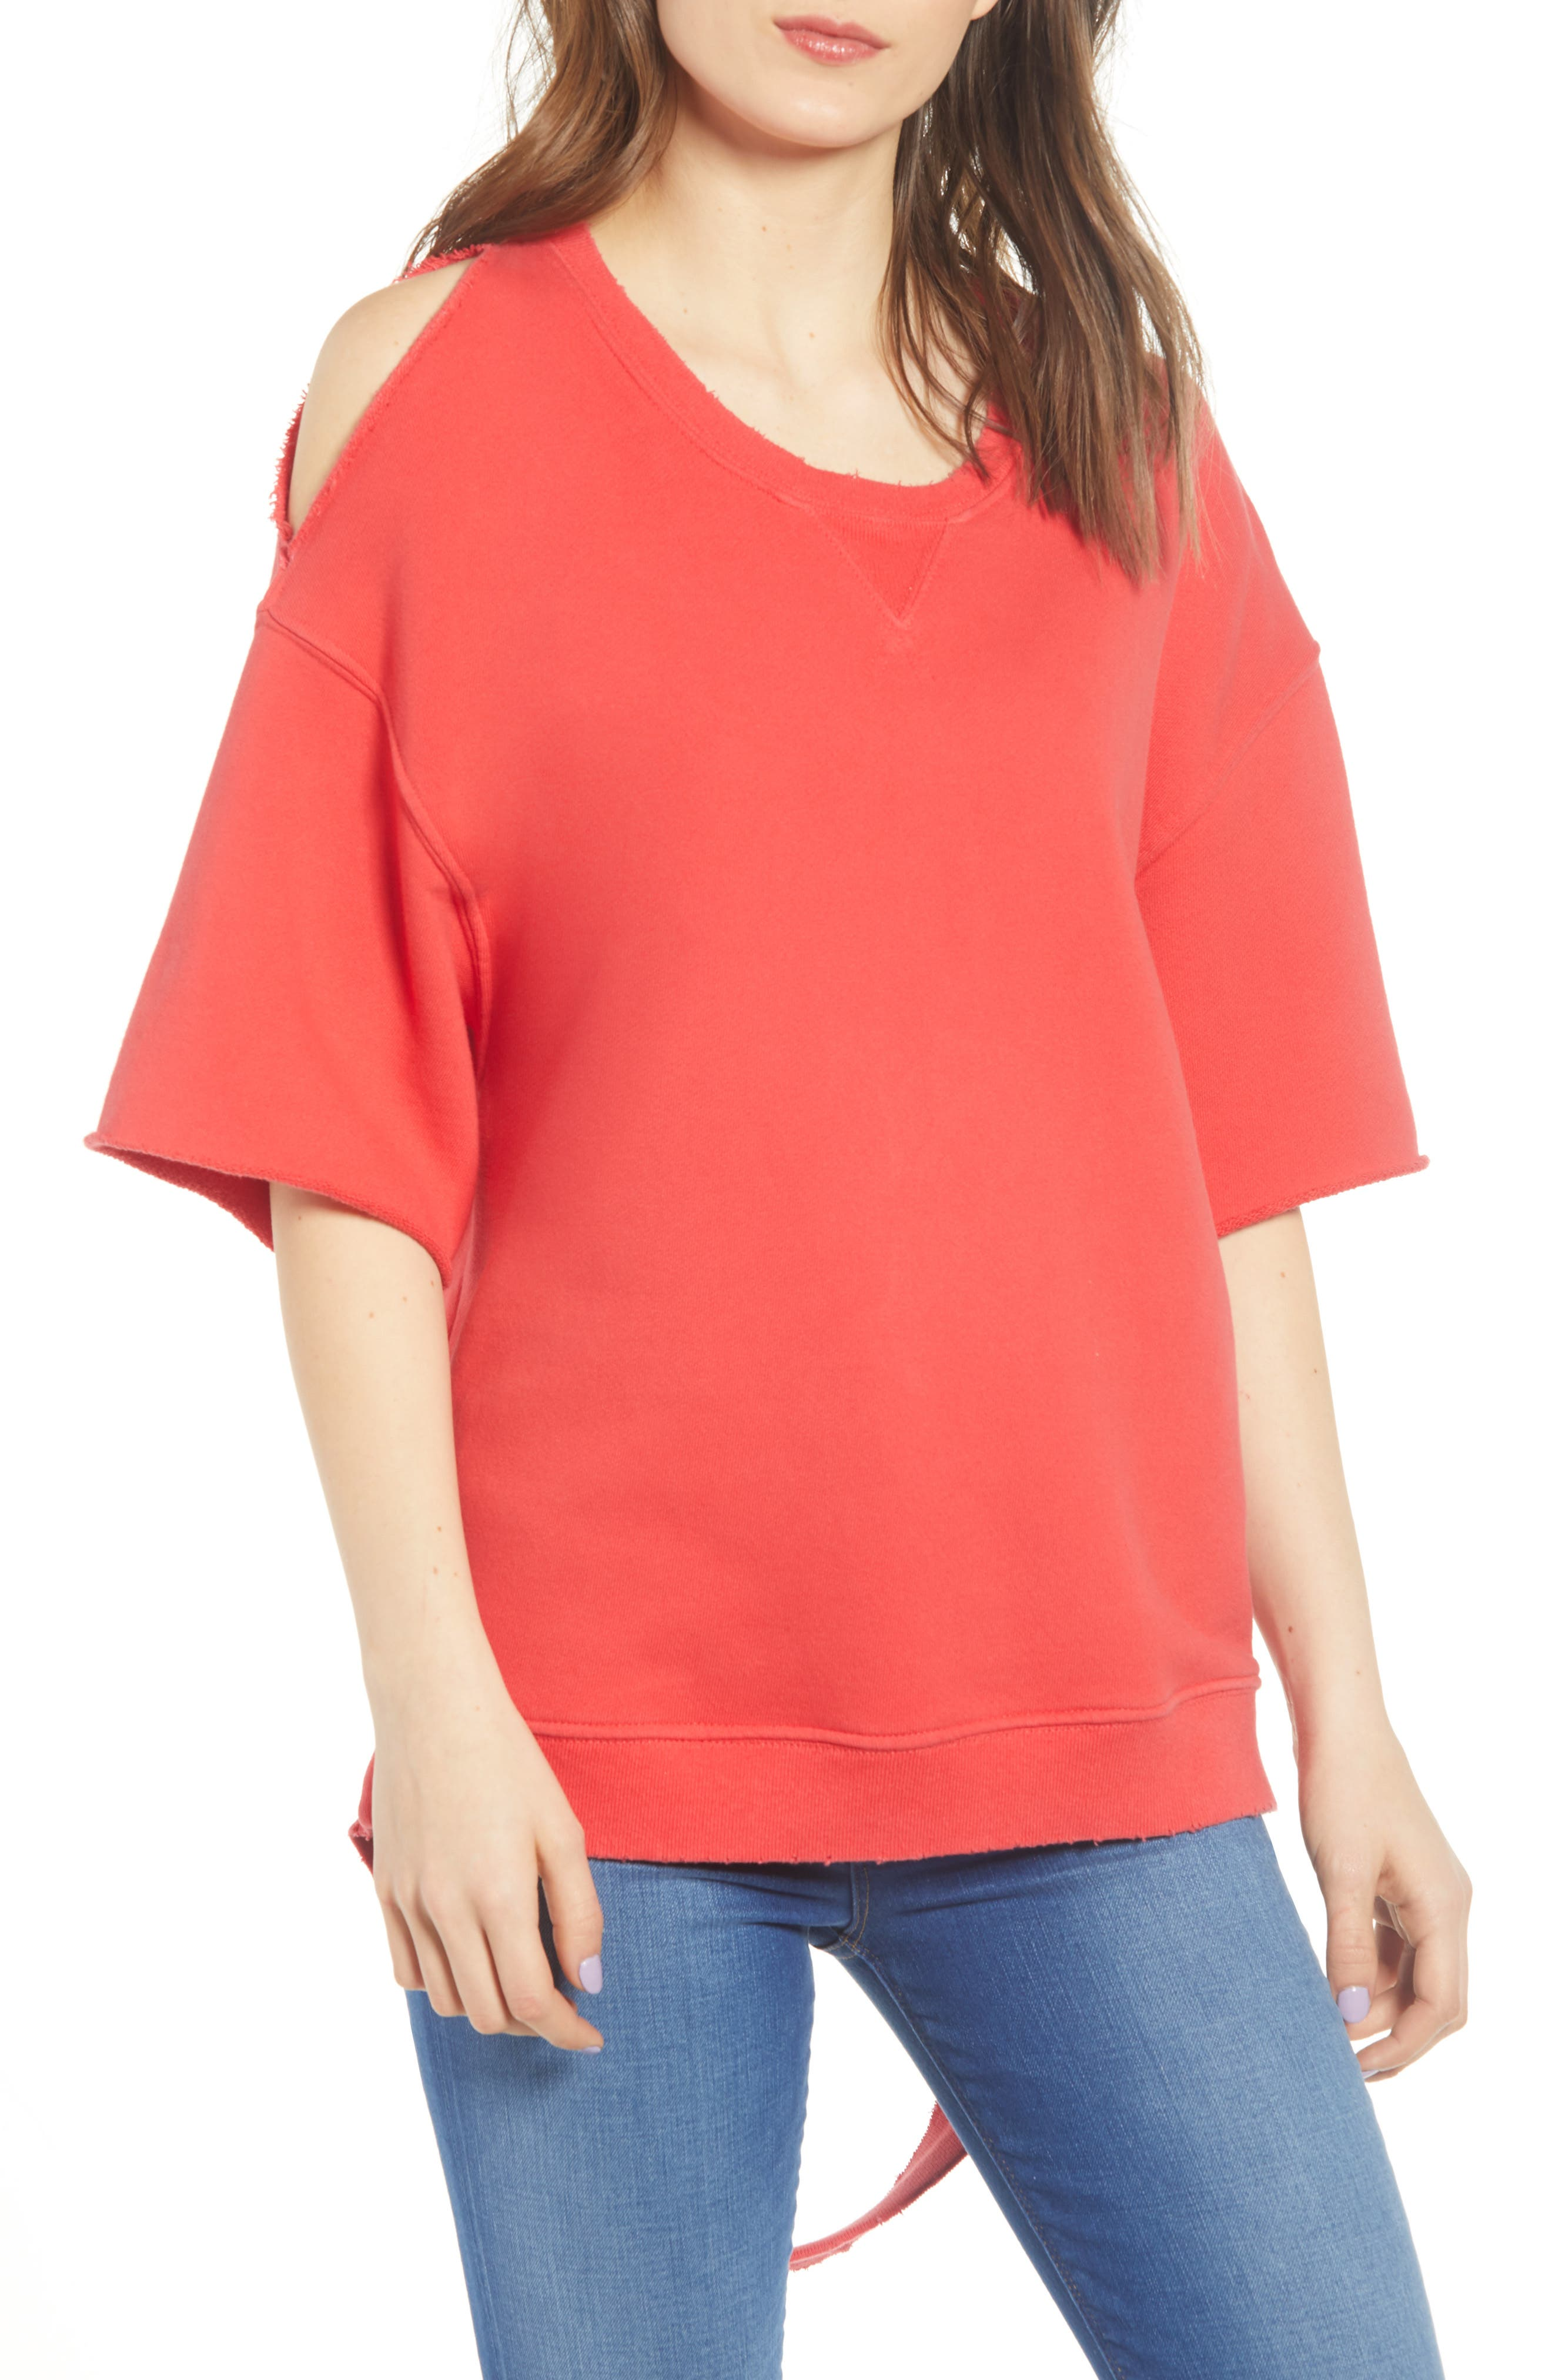 Hudson Jeans Cutout Sweatshirt, Red